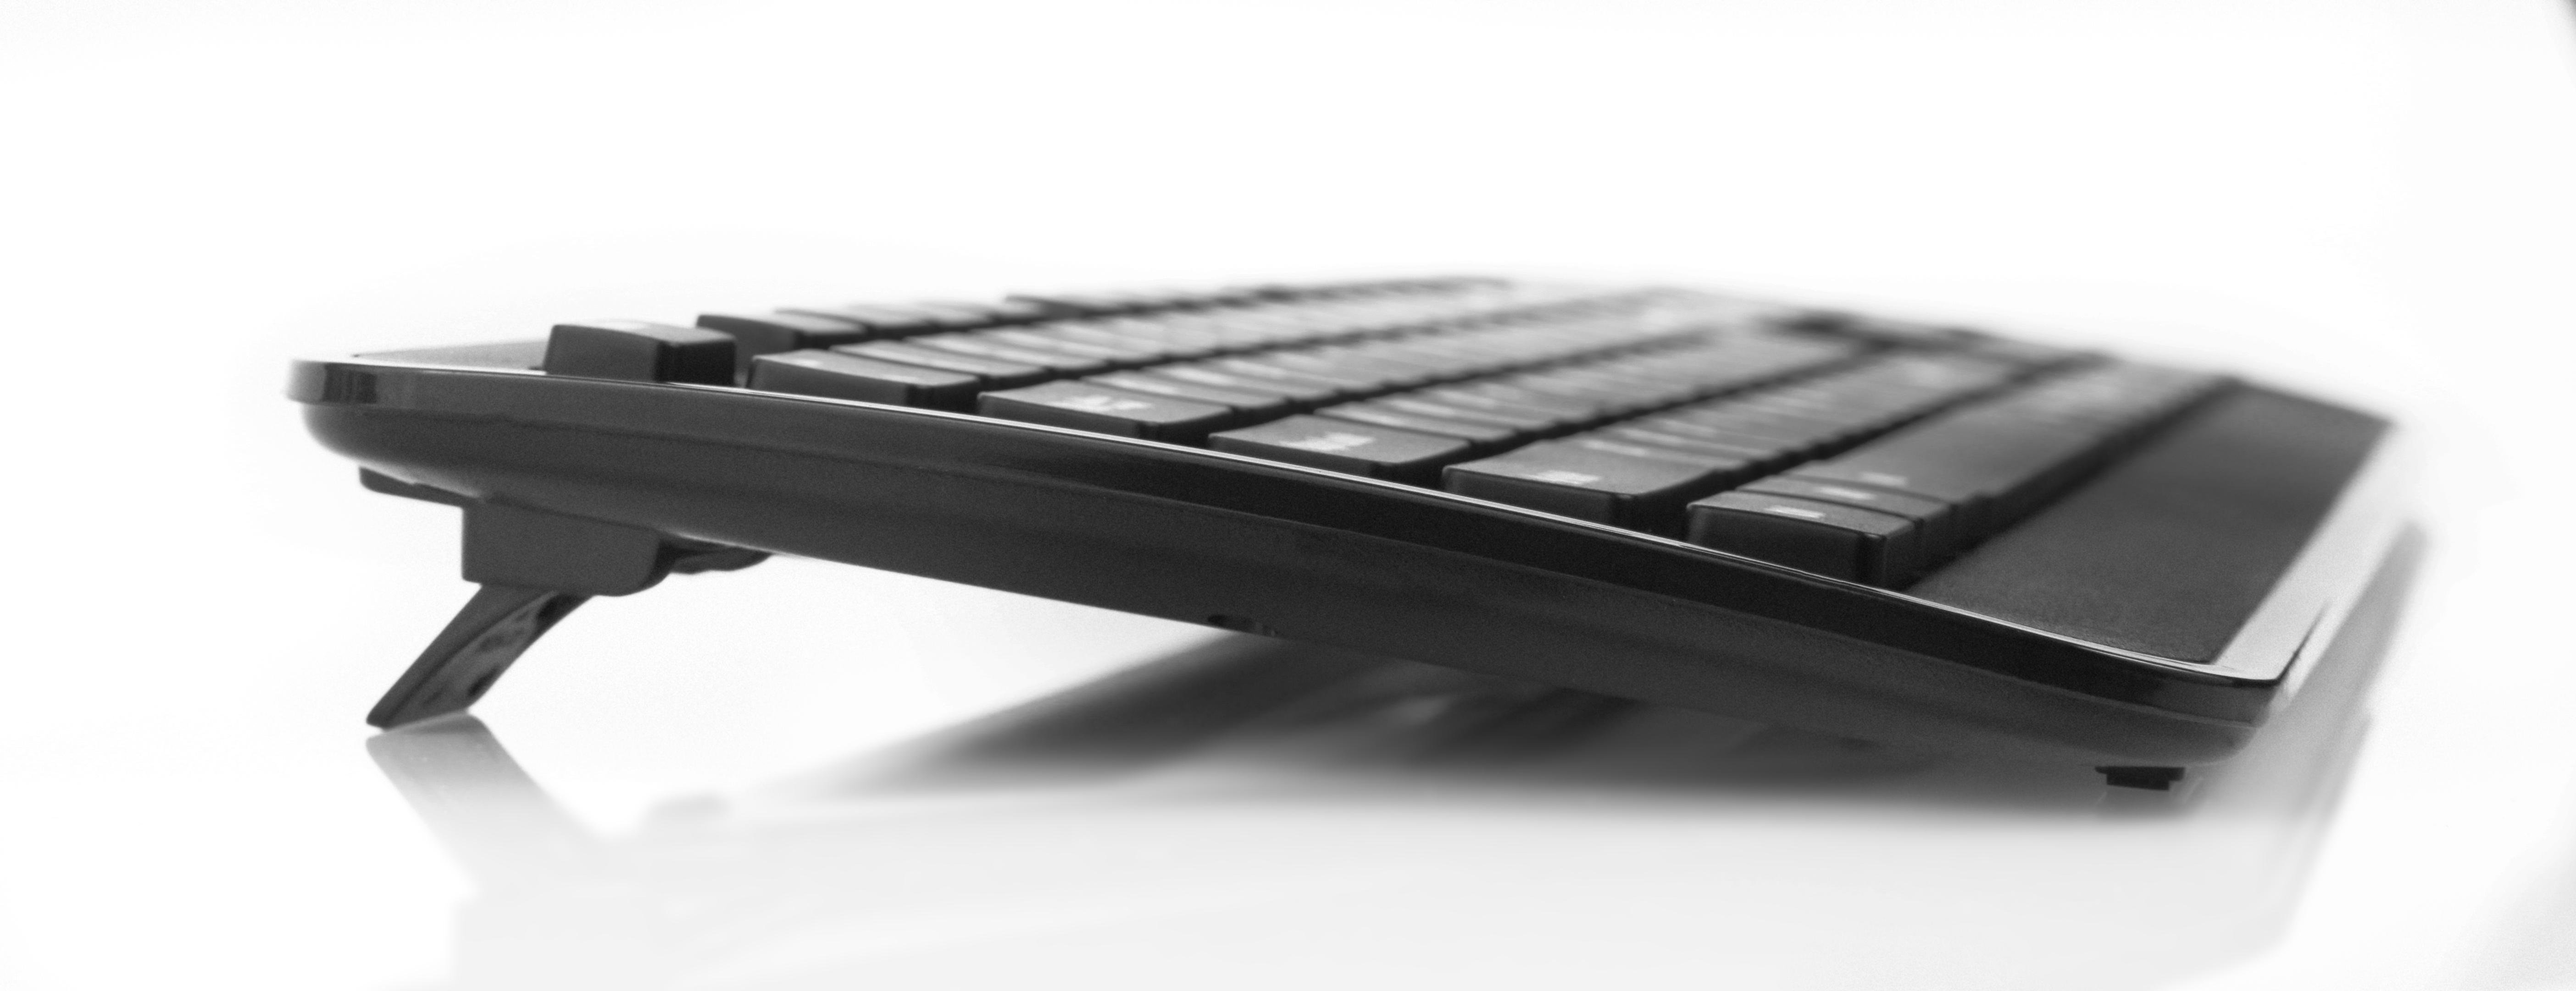 e136e1951e0 Wireless Mouse and Keyboard (Black)